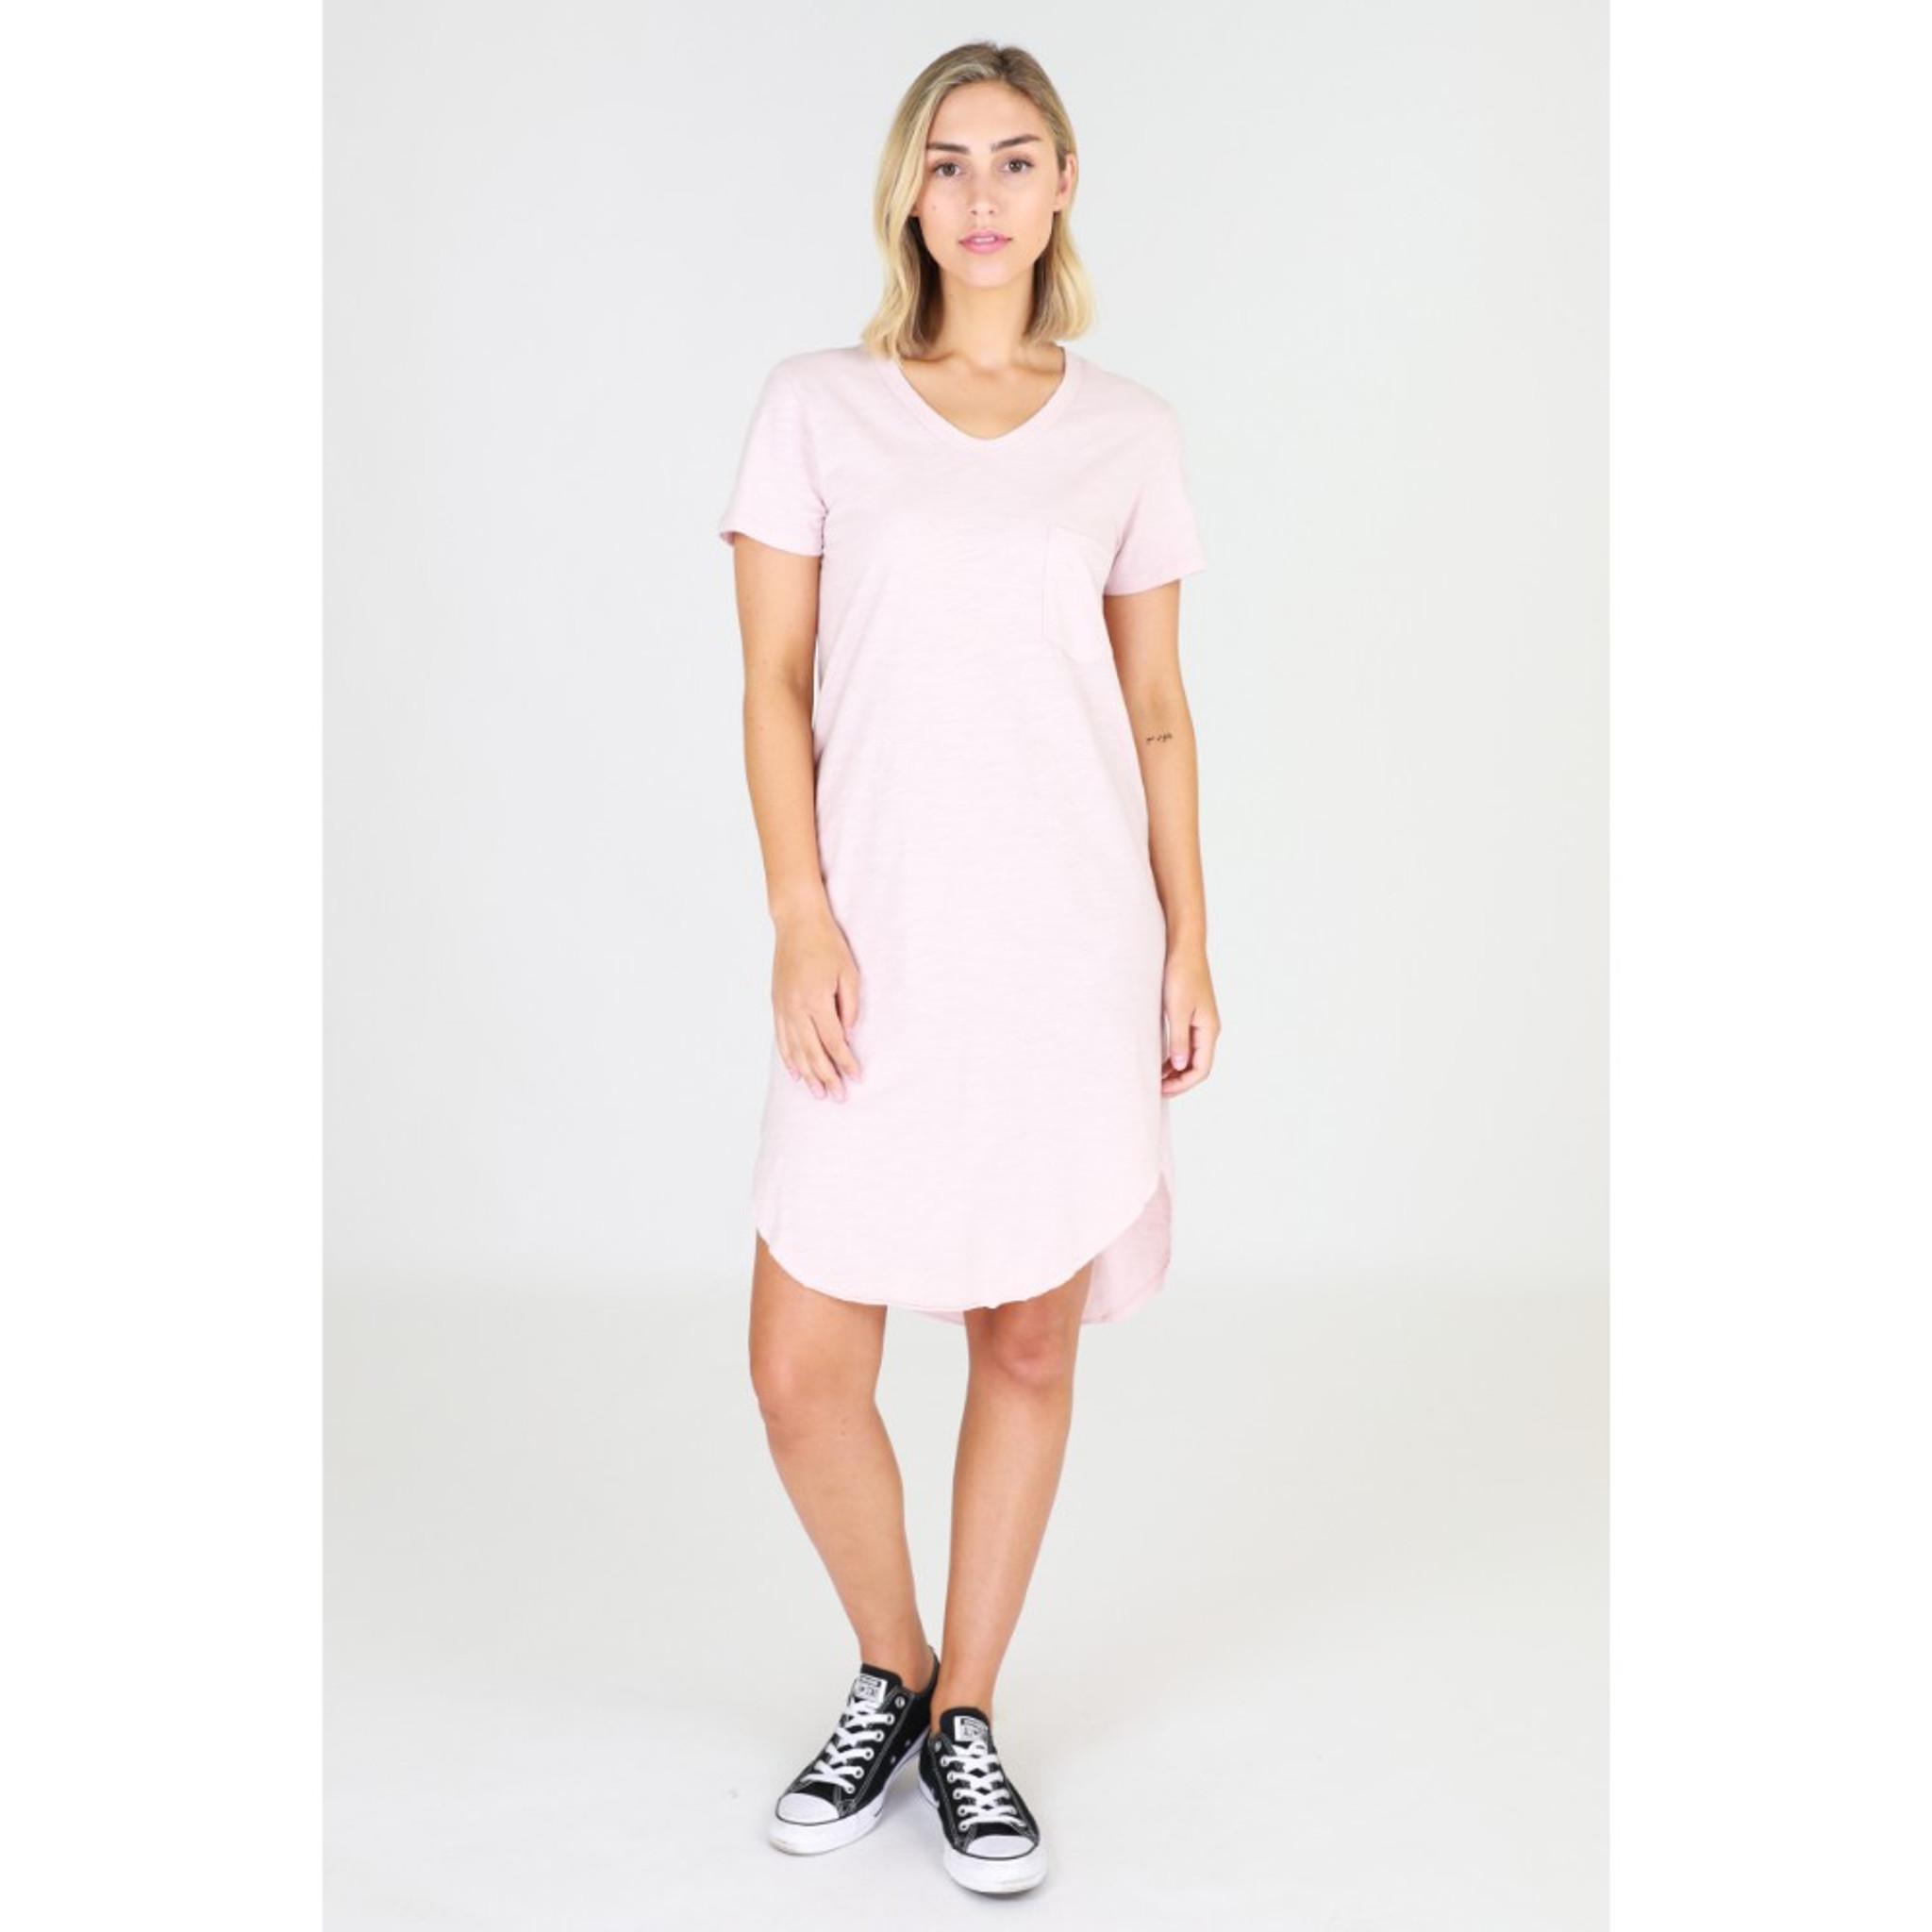 166fd0bae4a7 Milly Dress by 3RD STORY | Women's Dresses Australia | @ alibiOnline